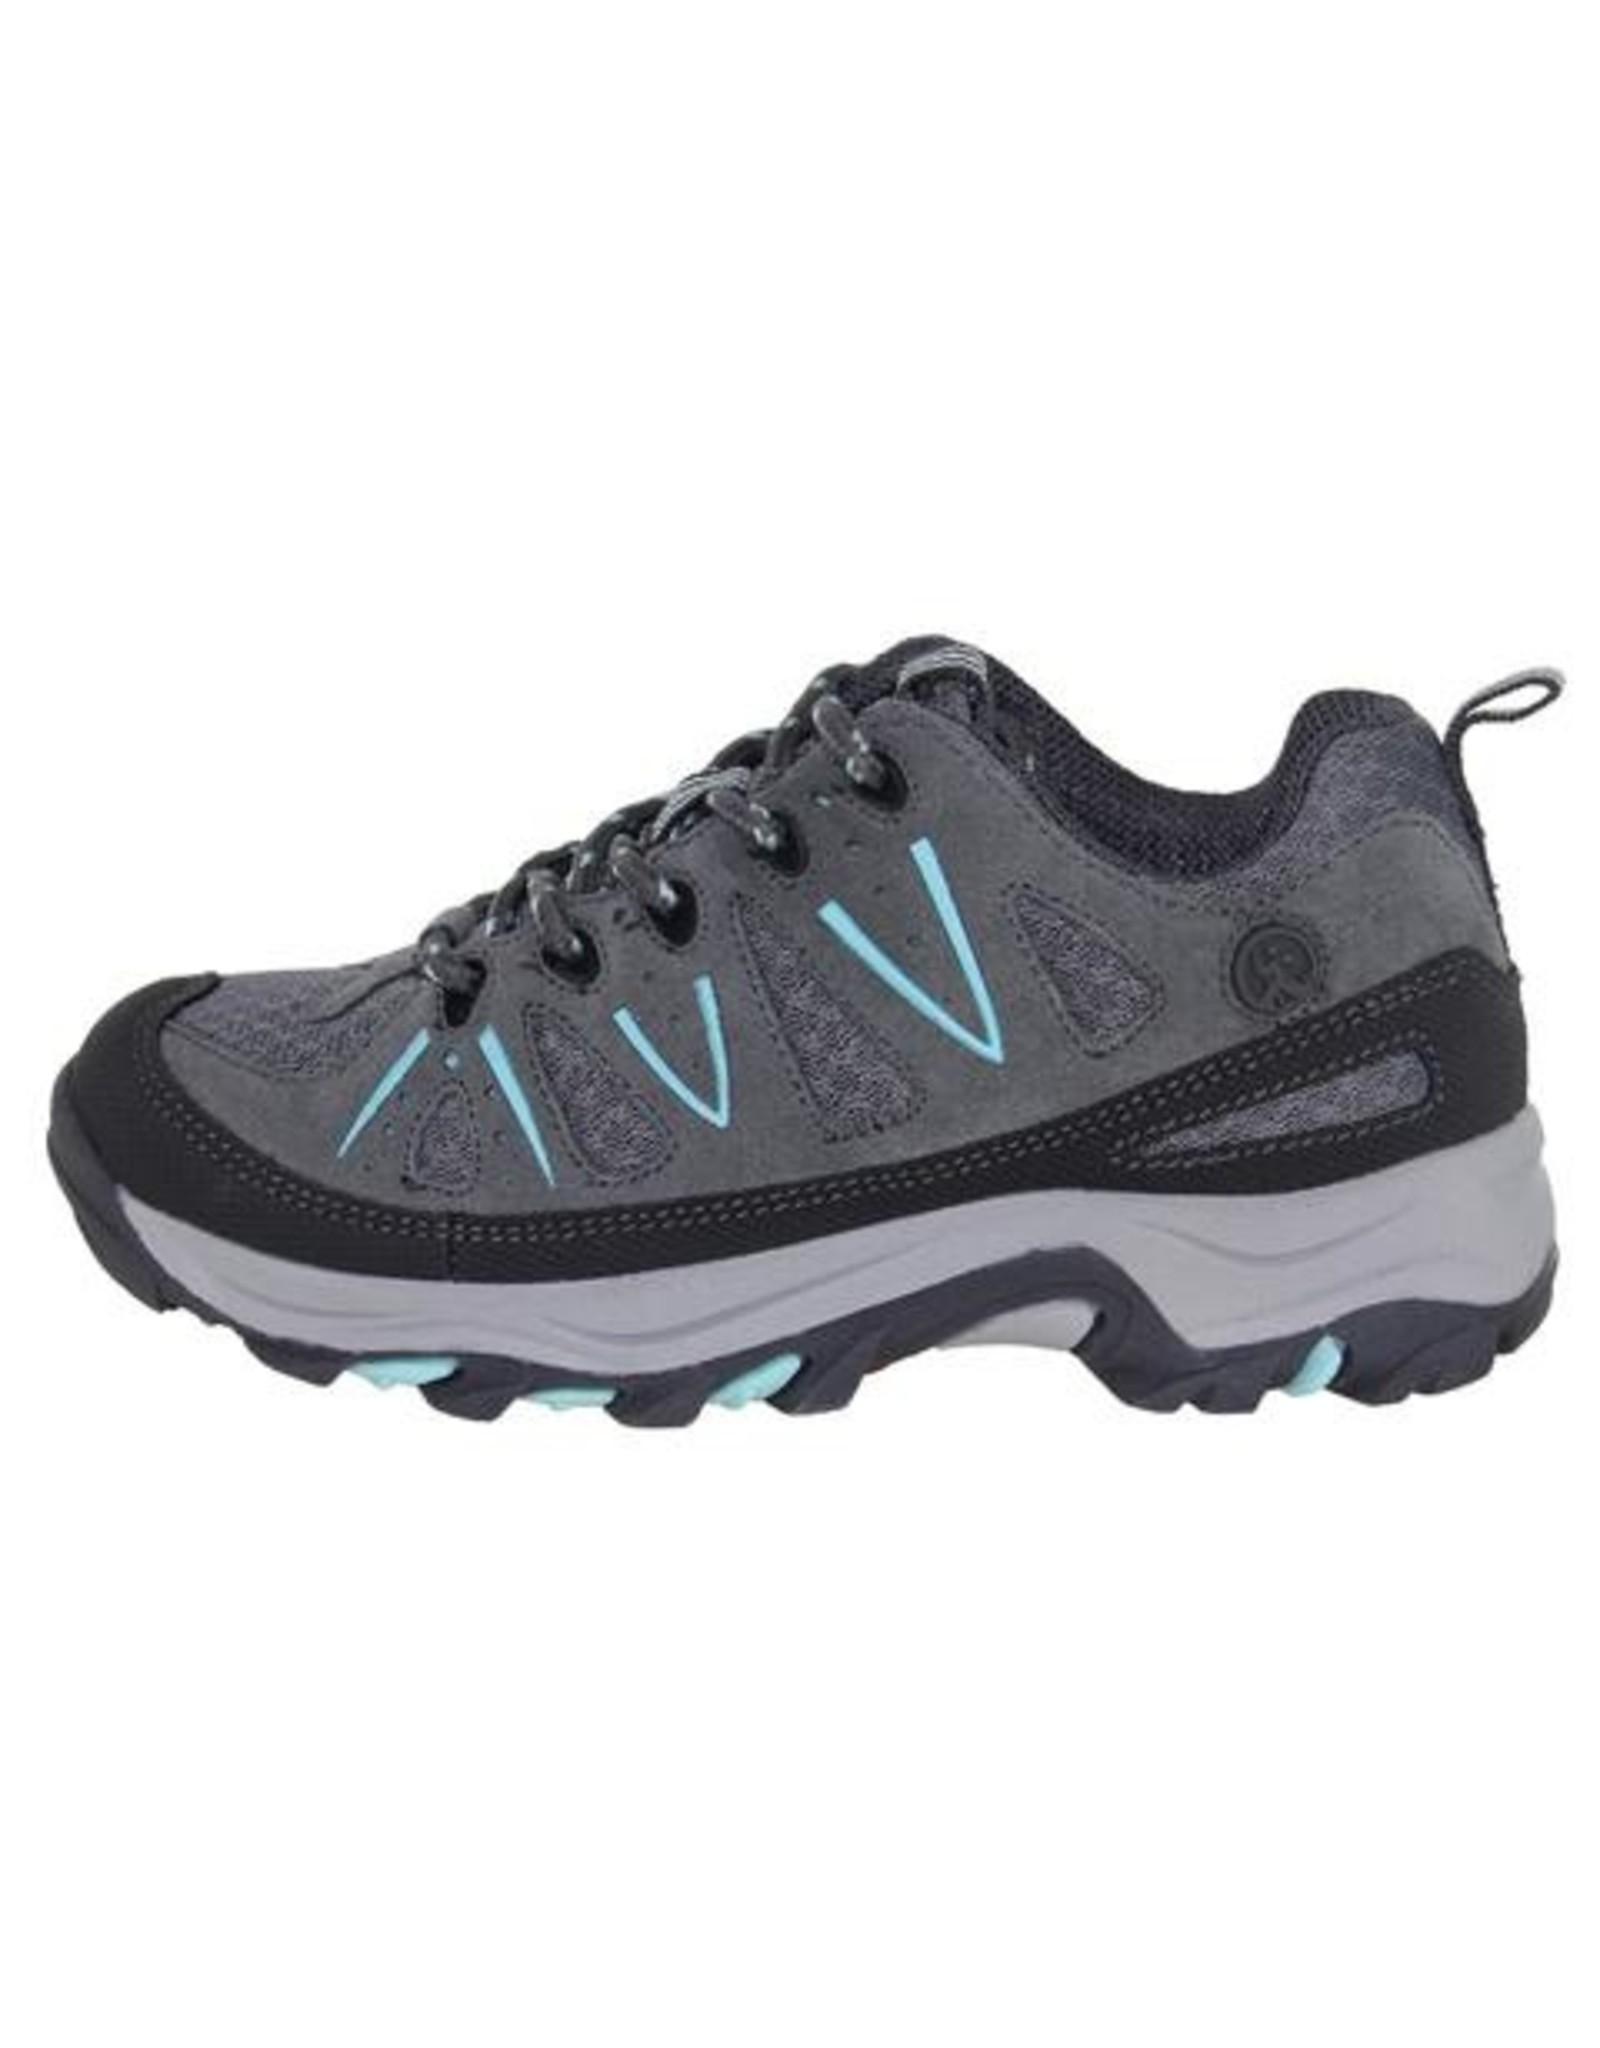 Northside Kids Cheyenne Jr Hiking Shoe